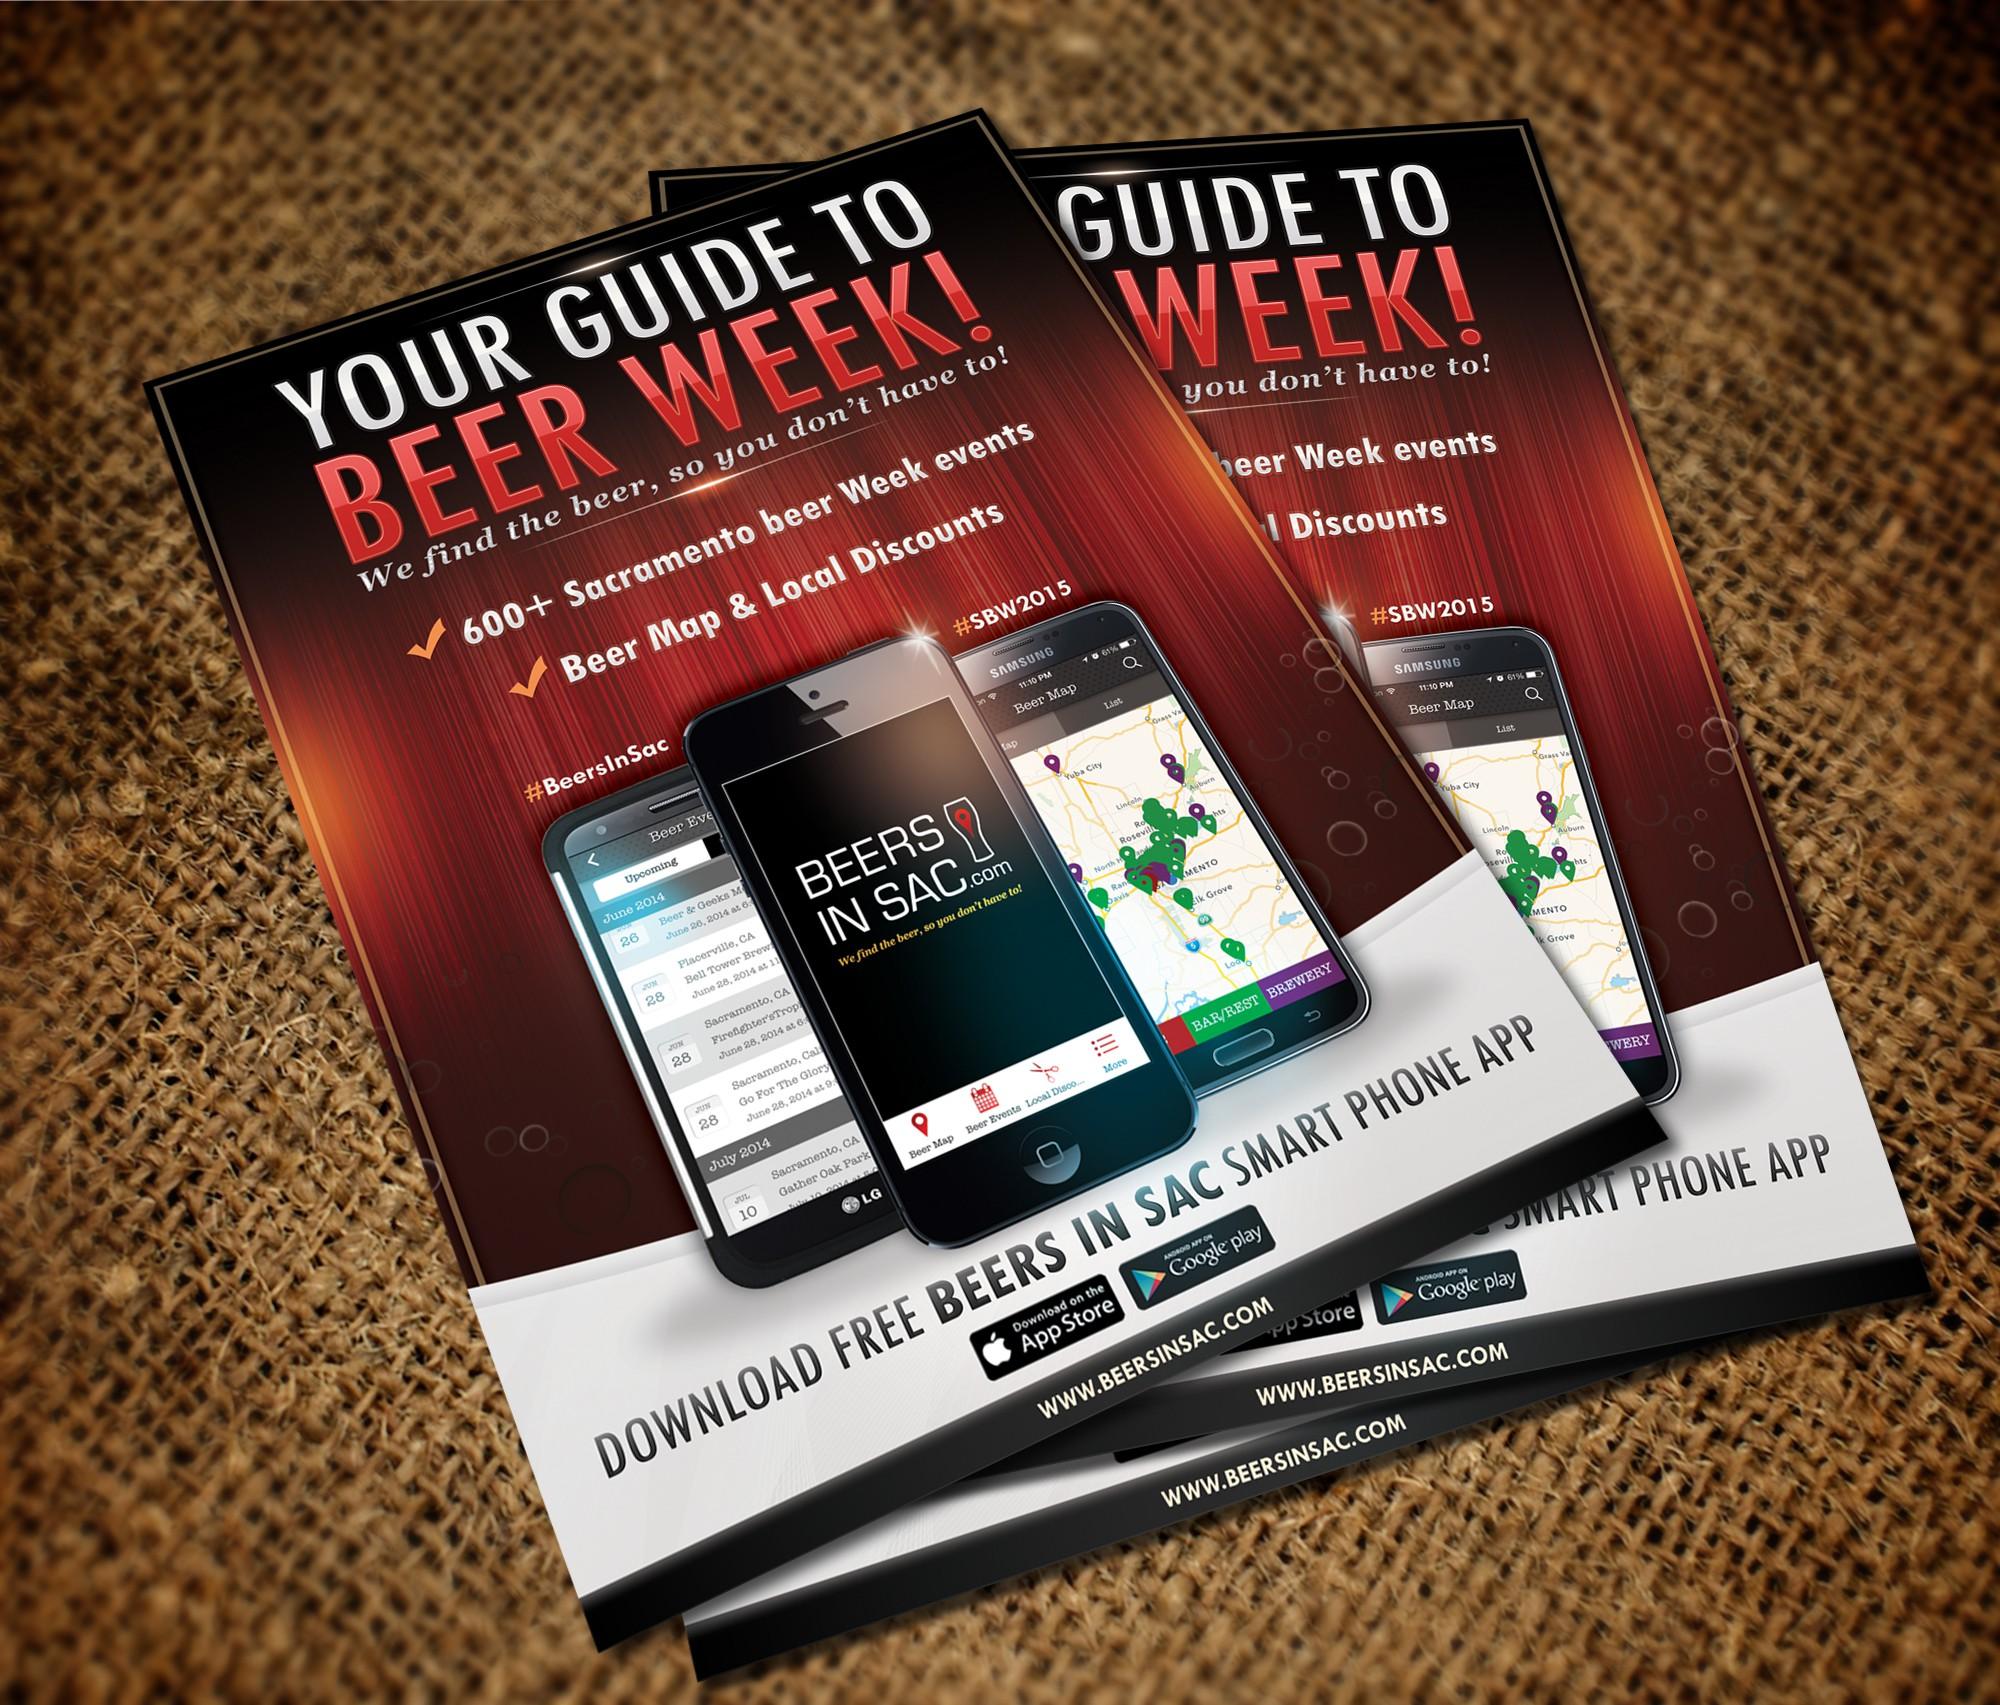 Flyer for beer related smartphone app!